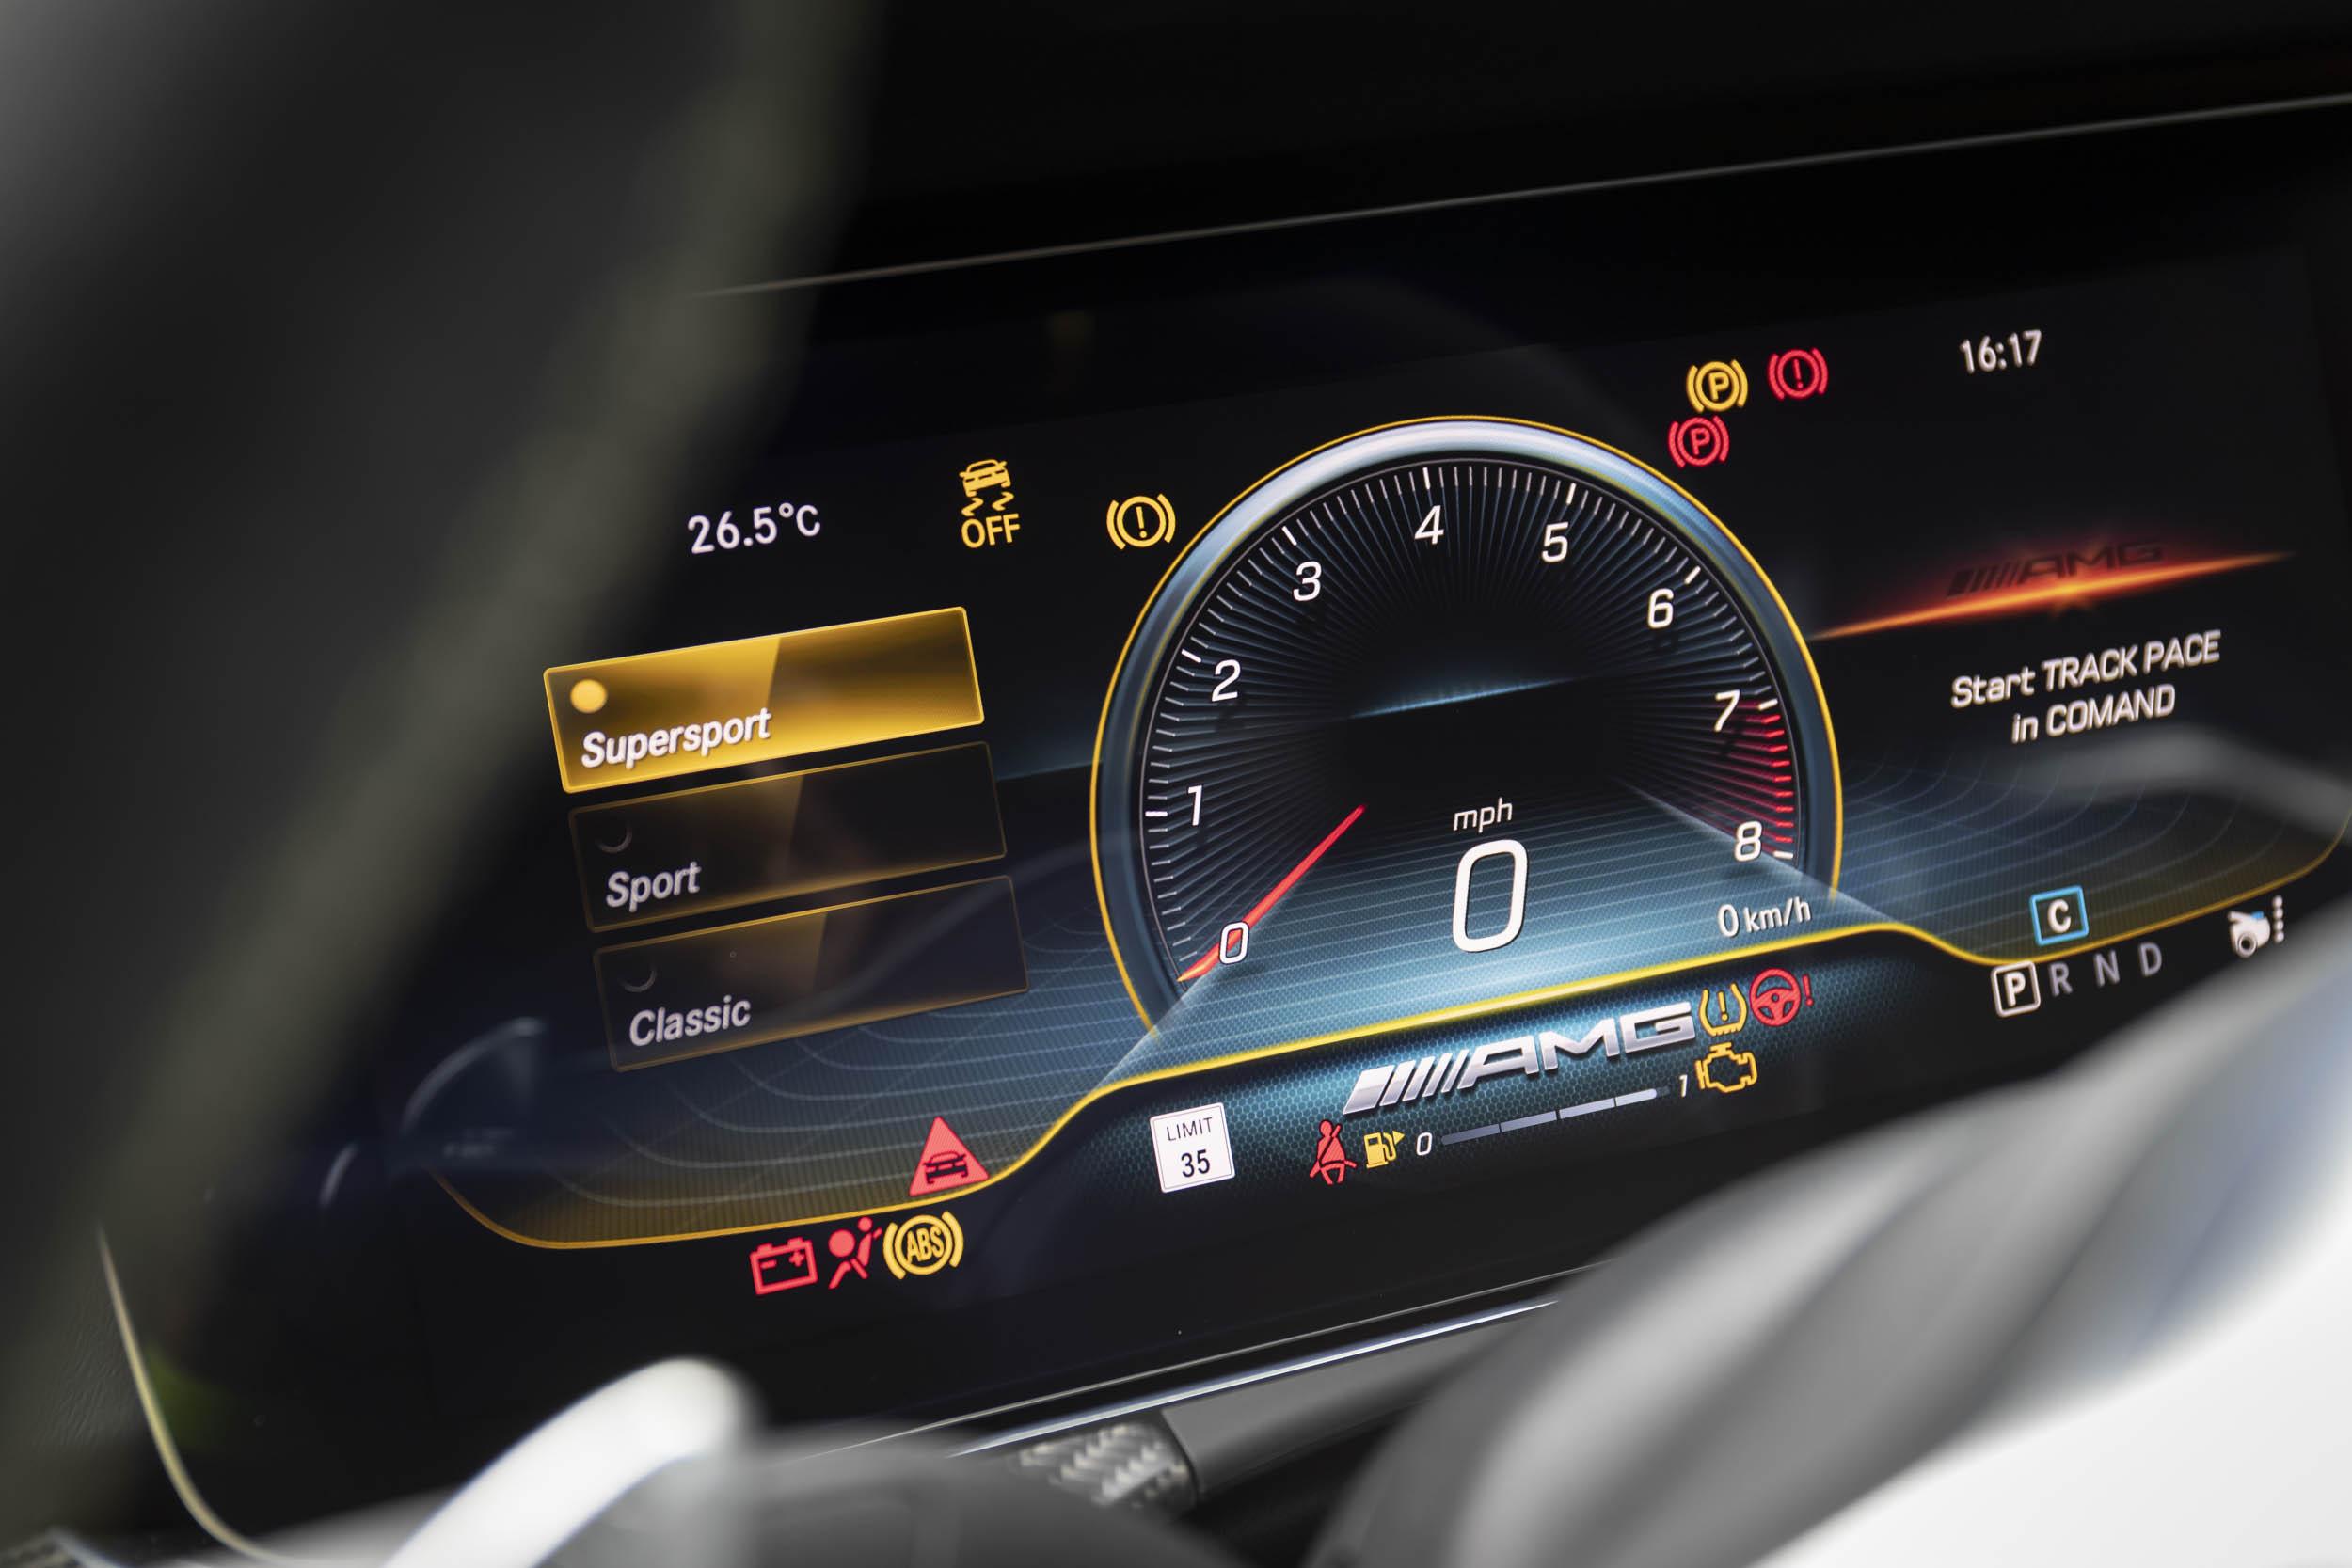 Mercedes-AMG GT 63 S odometer